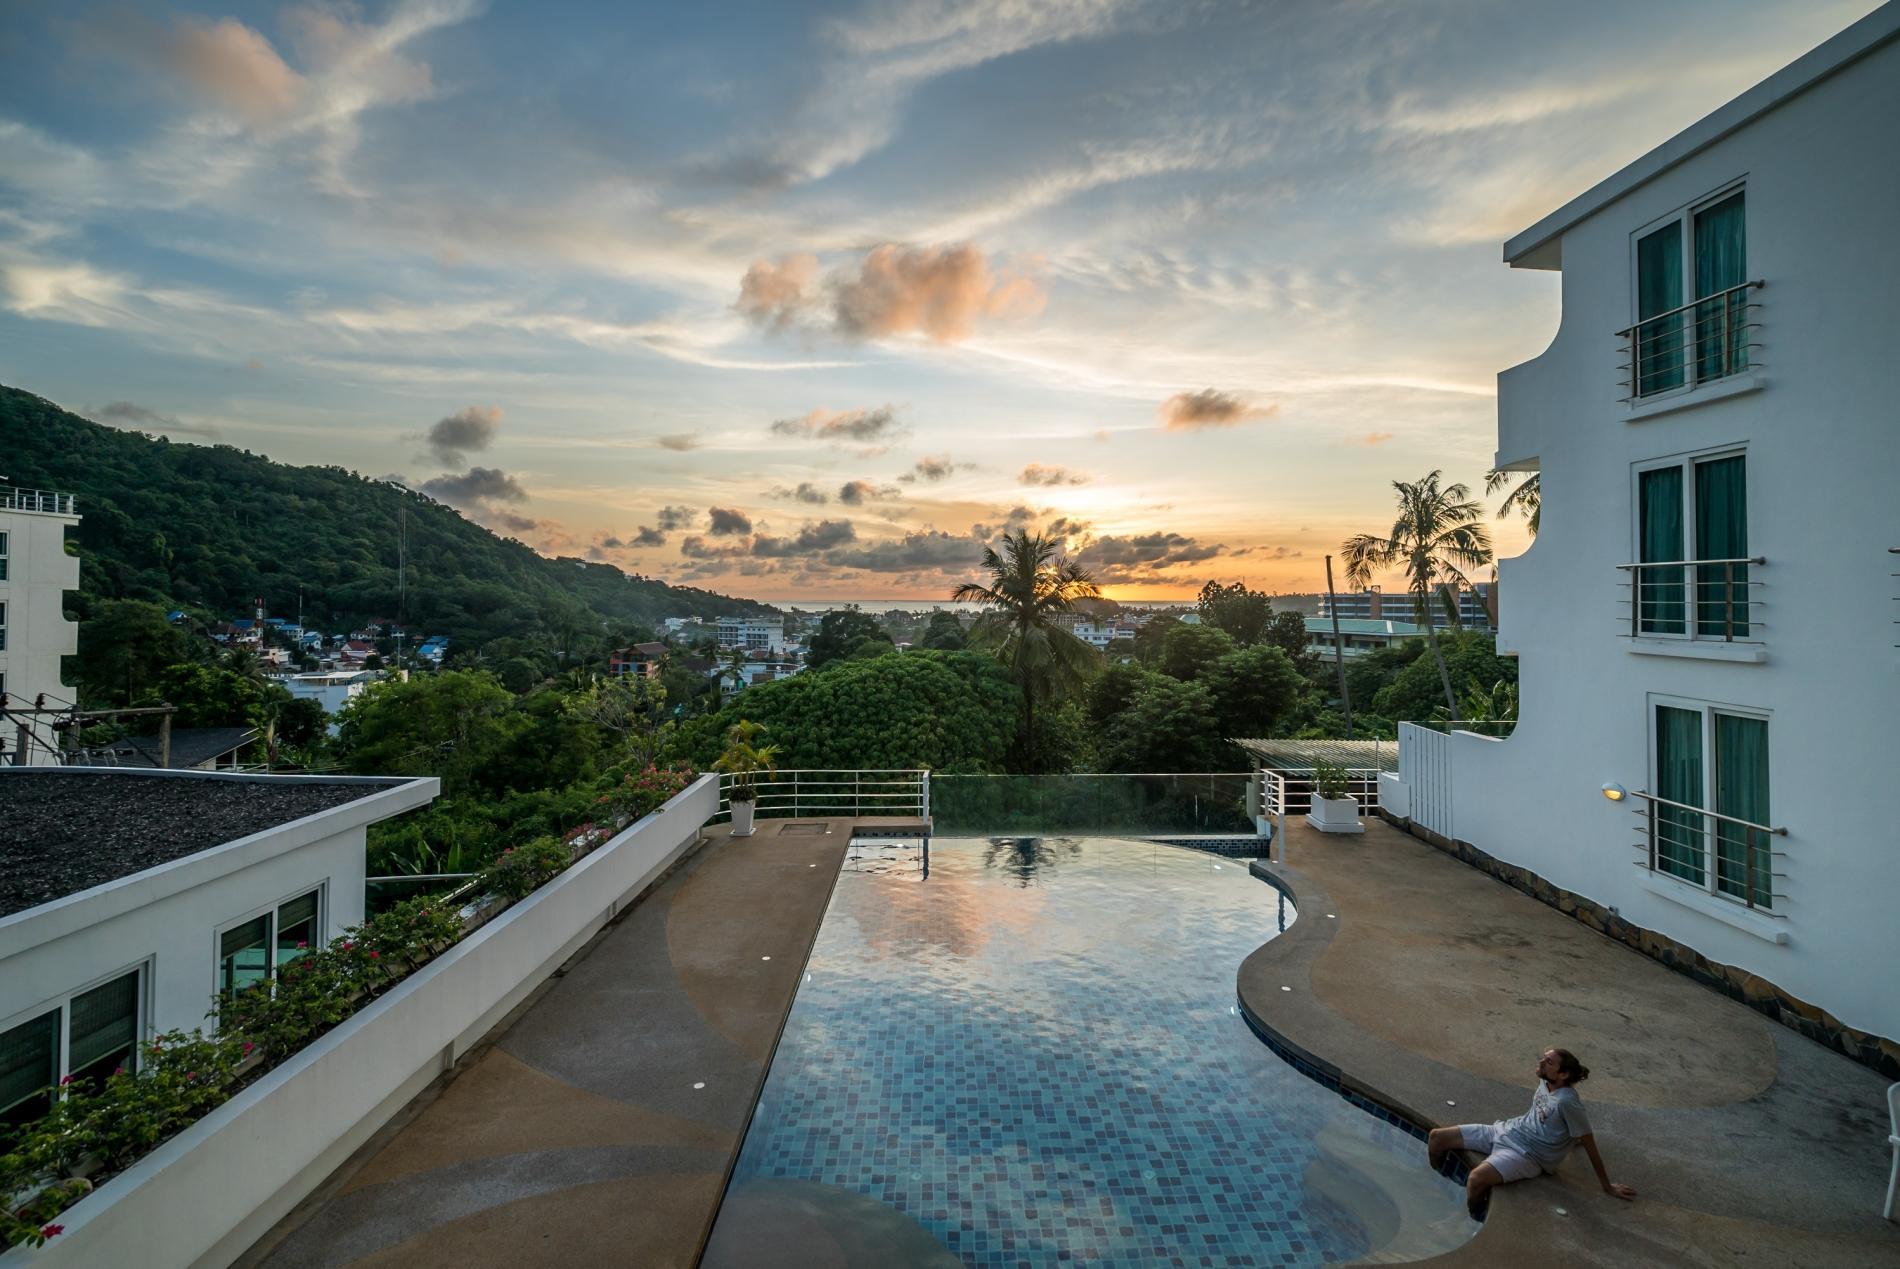 Apartment Kata Ocean View condominium - 1 bdr mountain view apartment photo 20177691